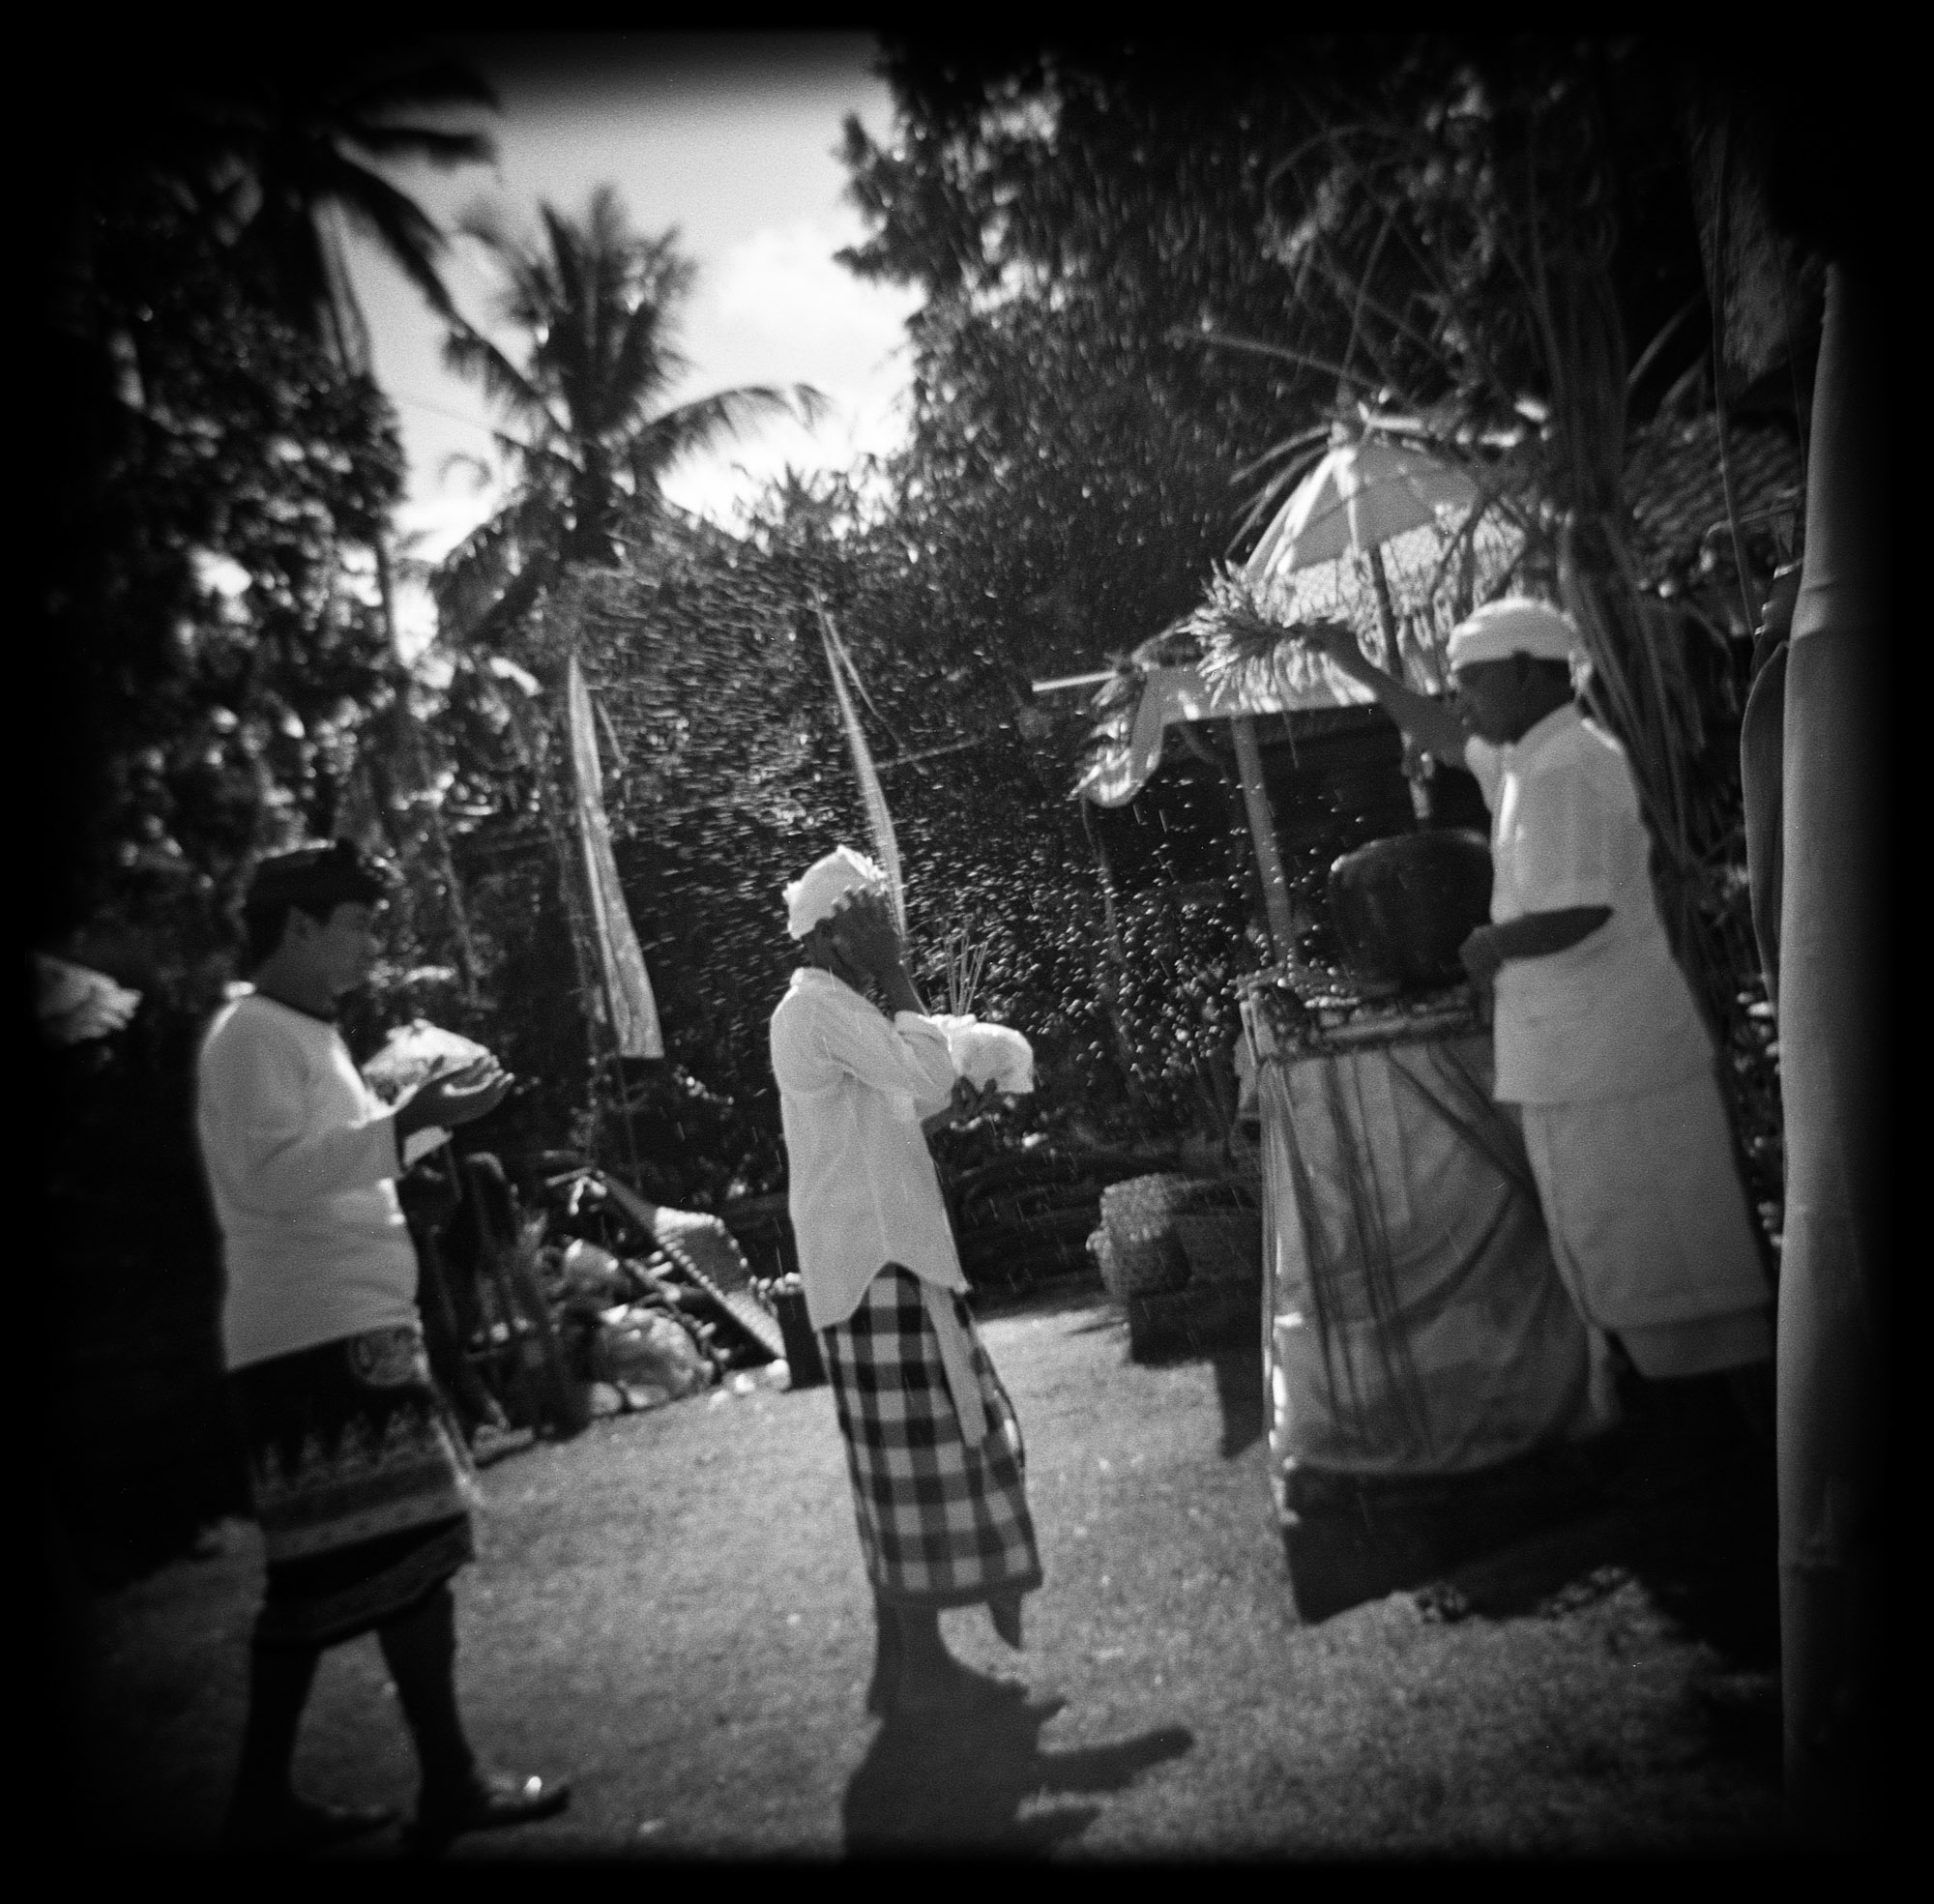 WebSP_methapisic spirituality_AgungParameswara_002.JPG